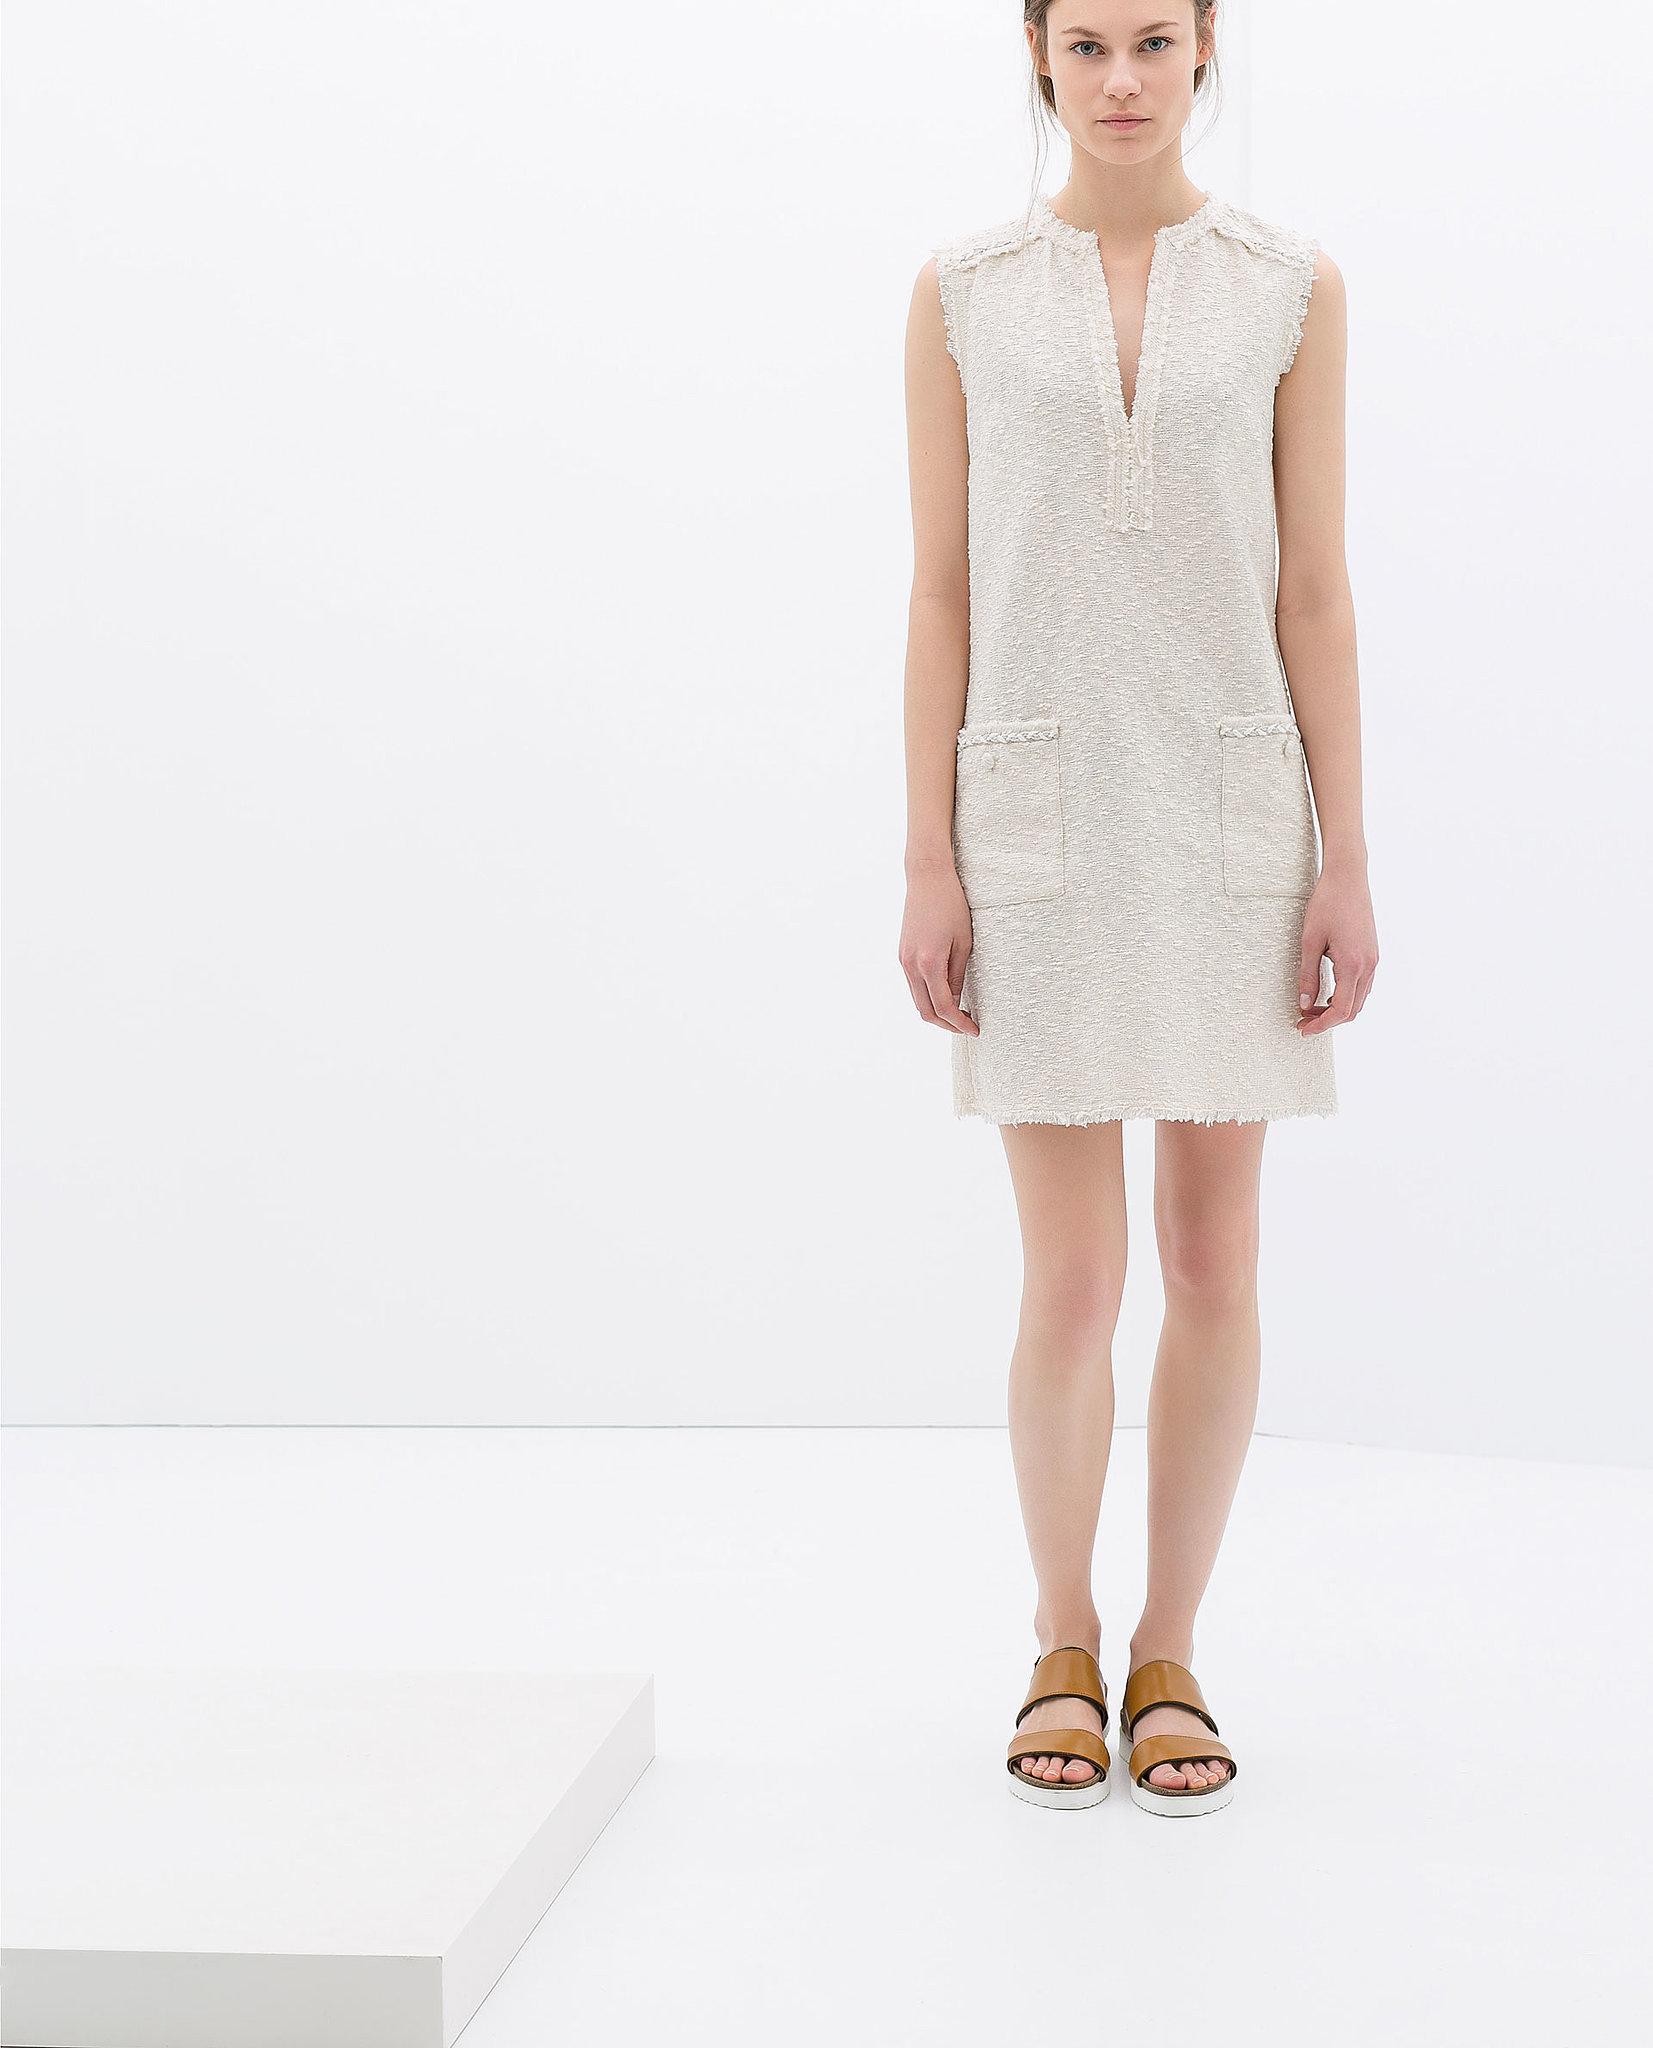 Zara white sleeveless boucle dress ($100)